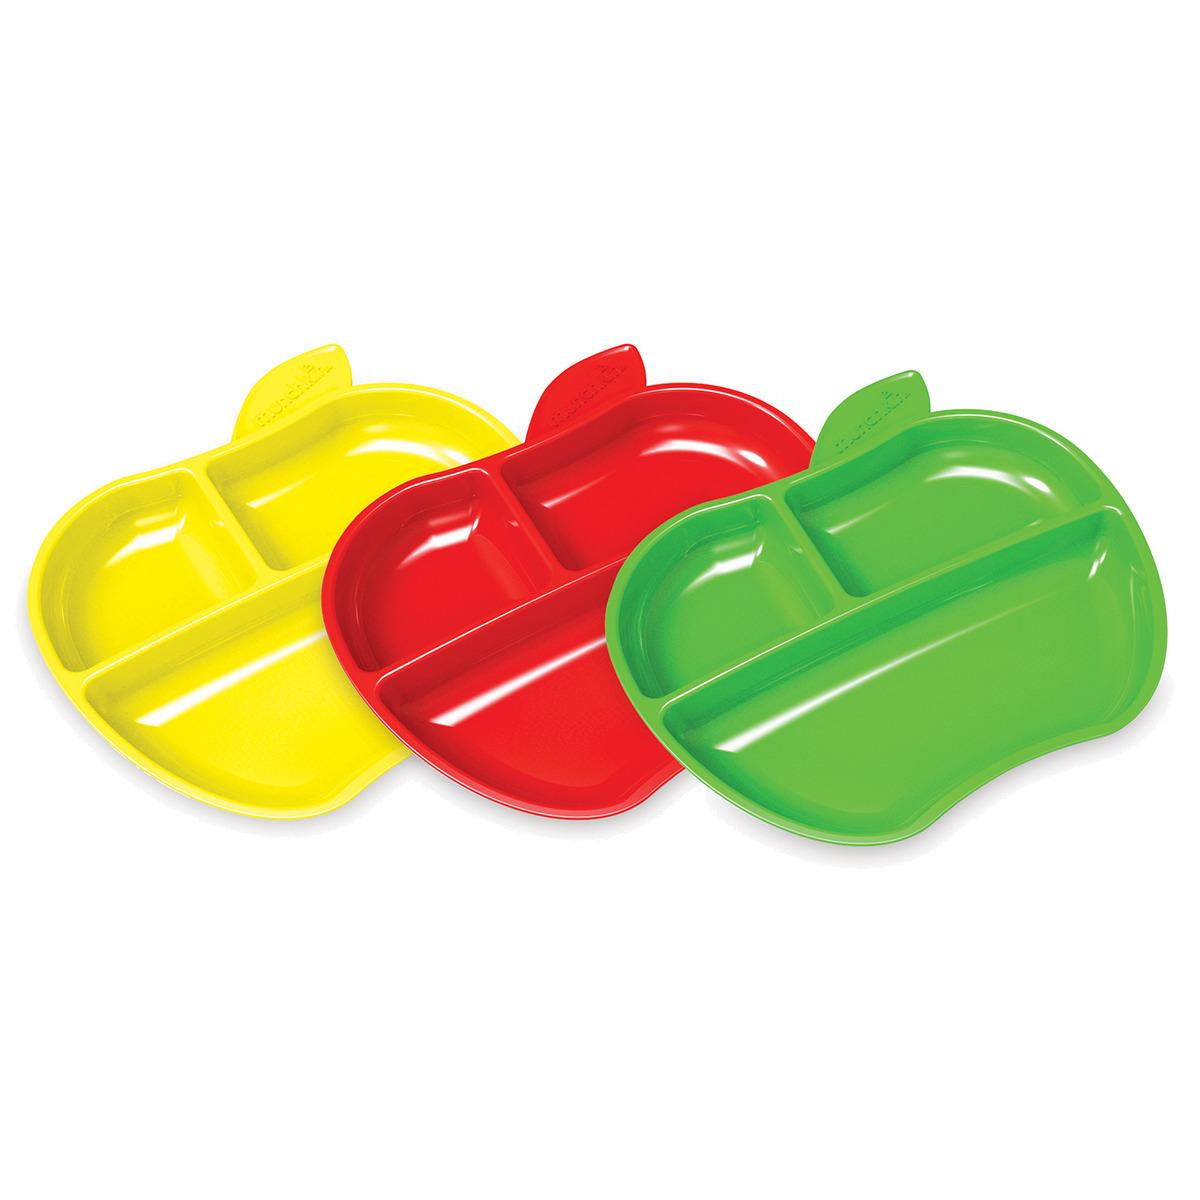 Munchkin-3 LIL' APPLE PLATES